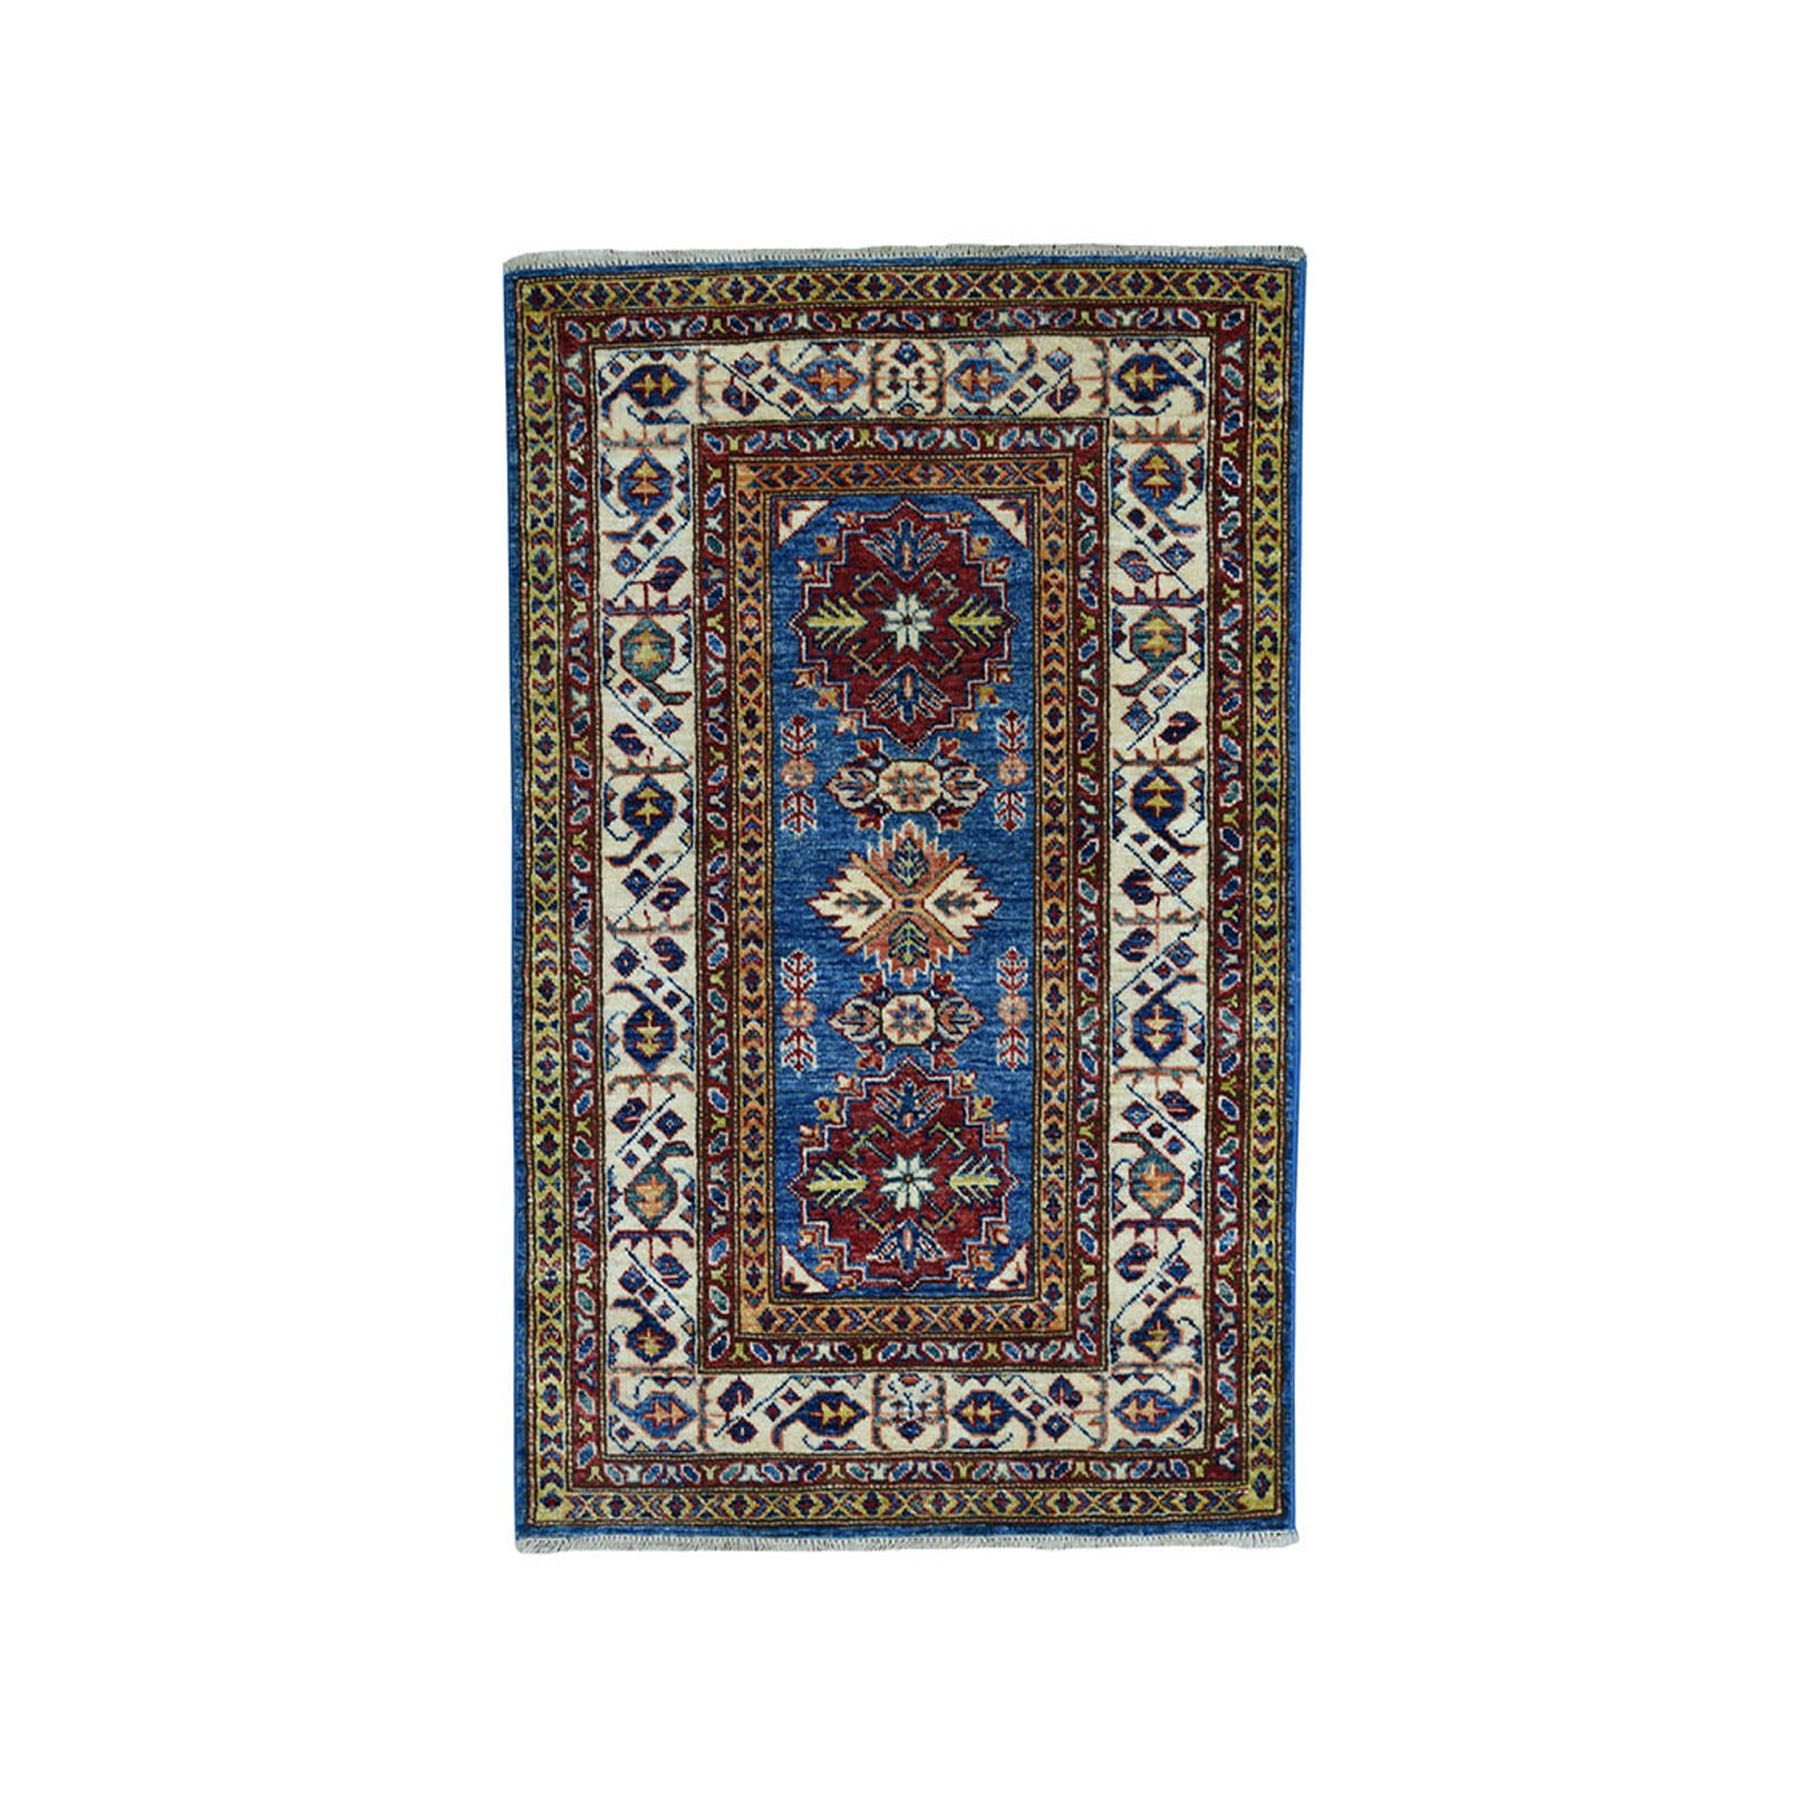 2-8 x4- Blue Super Kazak Pure Wool Geometric Design Hand-Knotted Oriental Rug